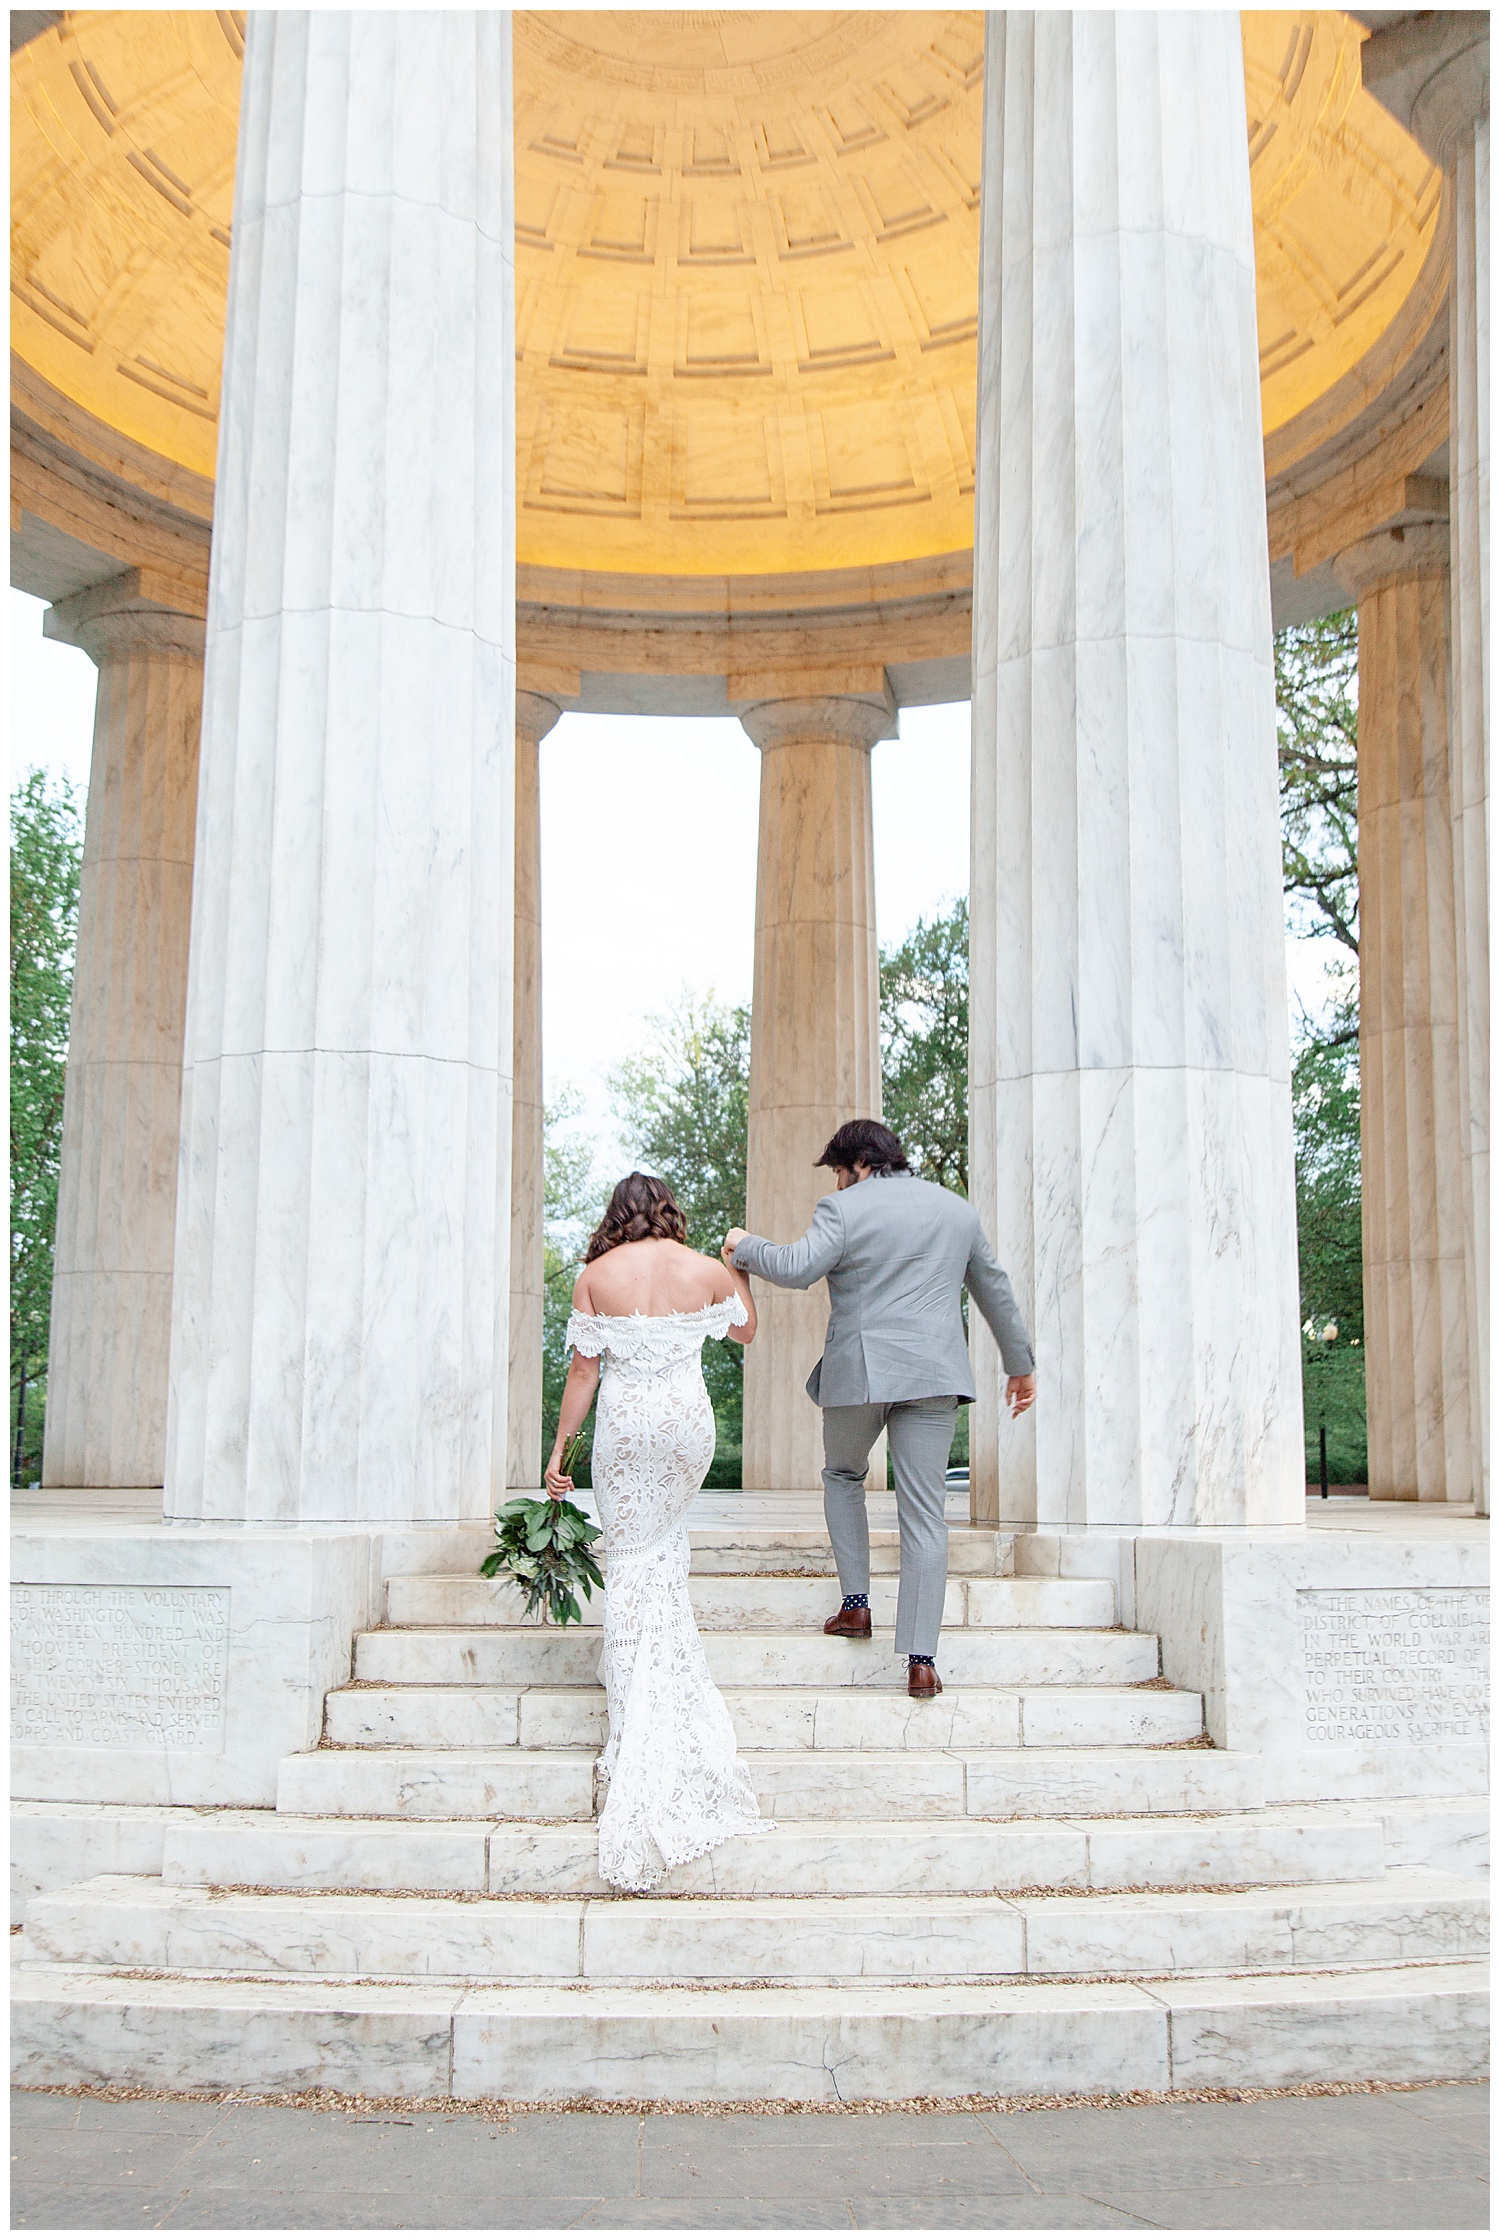 emily-belson-photography-washington-dc-wedding-39.jpg